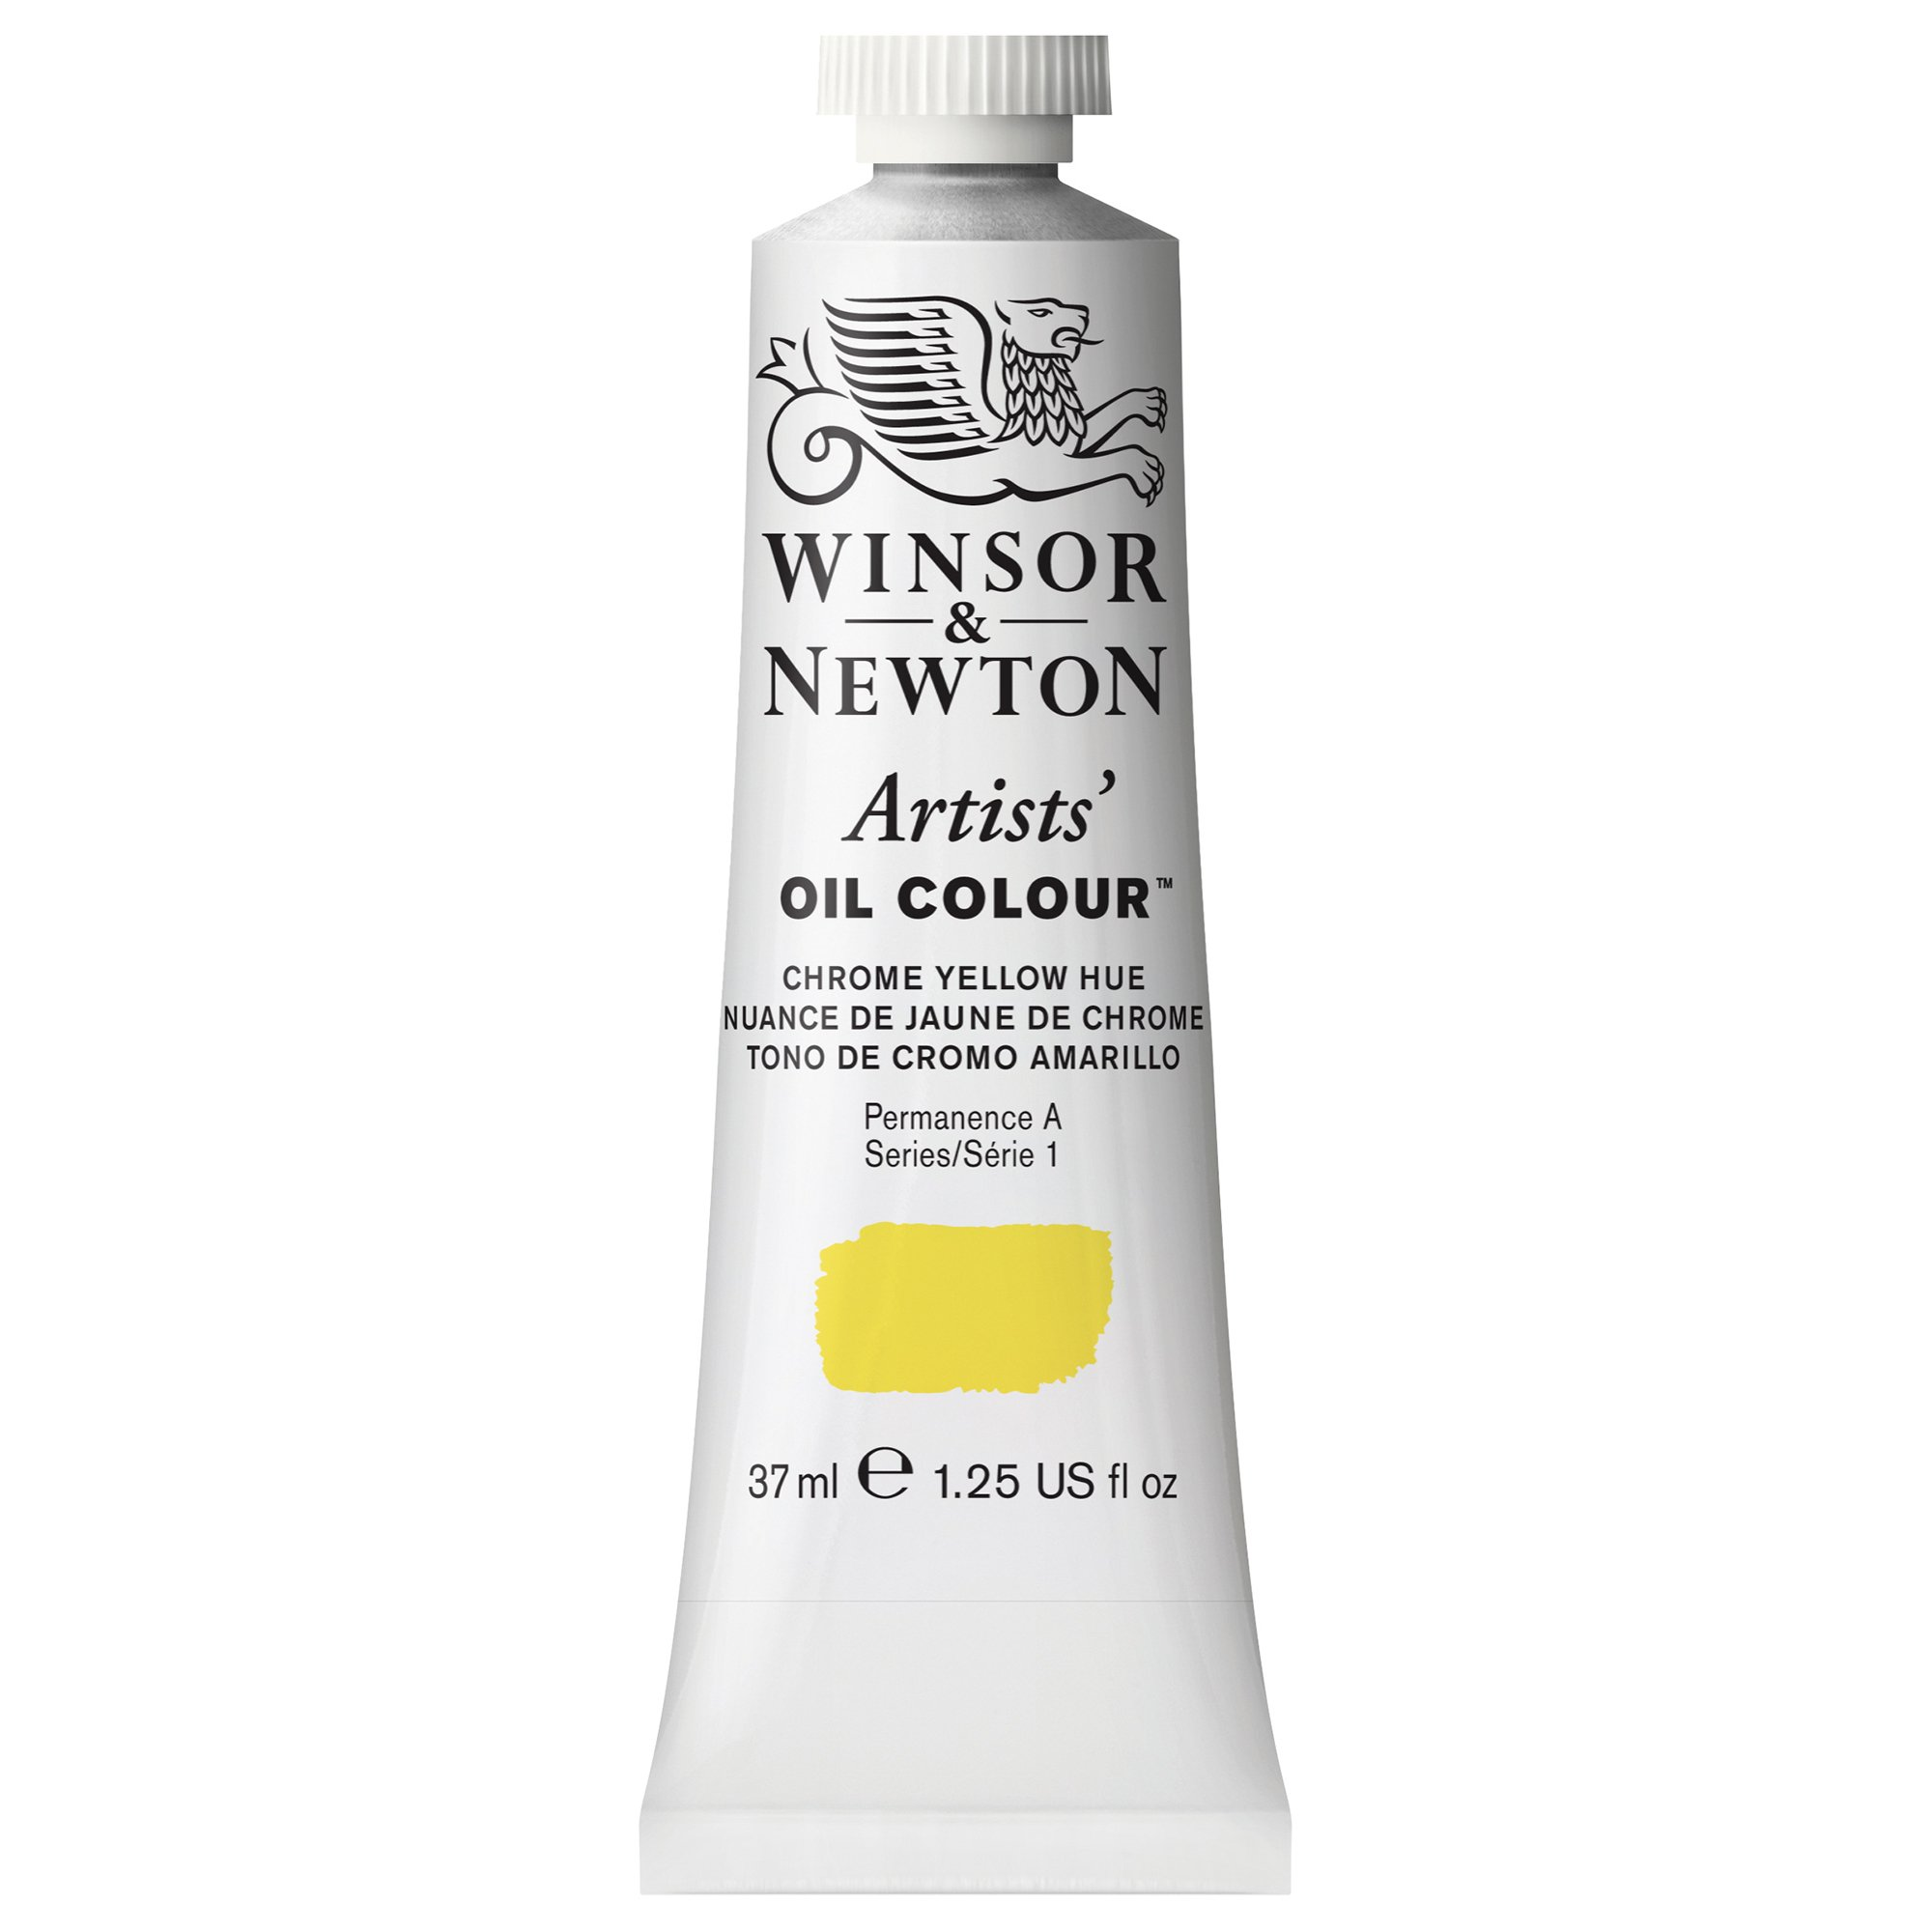 Winsor & Newton Artists' Oil Colour Paint, 37ml Tube, Chrome Yellow Hue